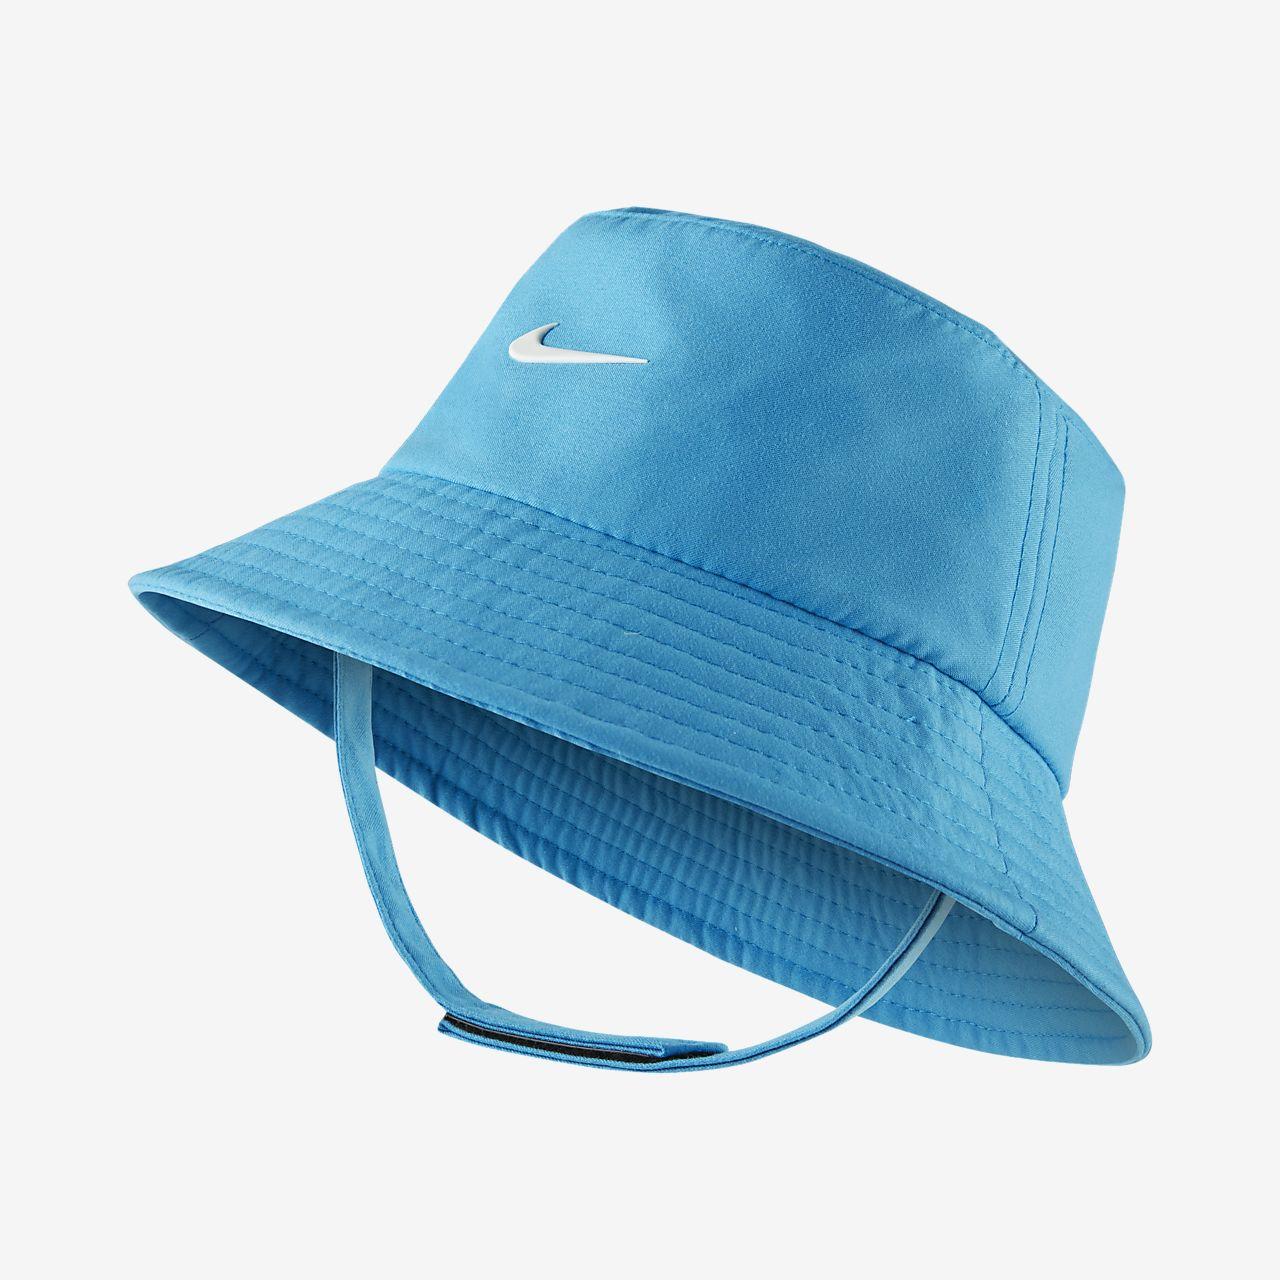 ... new arrivals nike dri fit infant bucket hat 42afd 68153 51dcdf994da